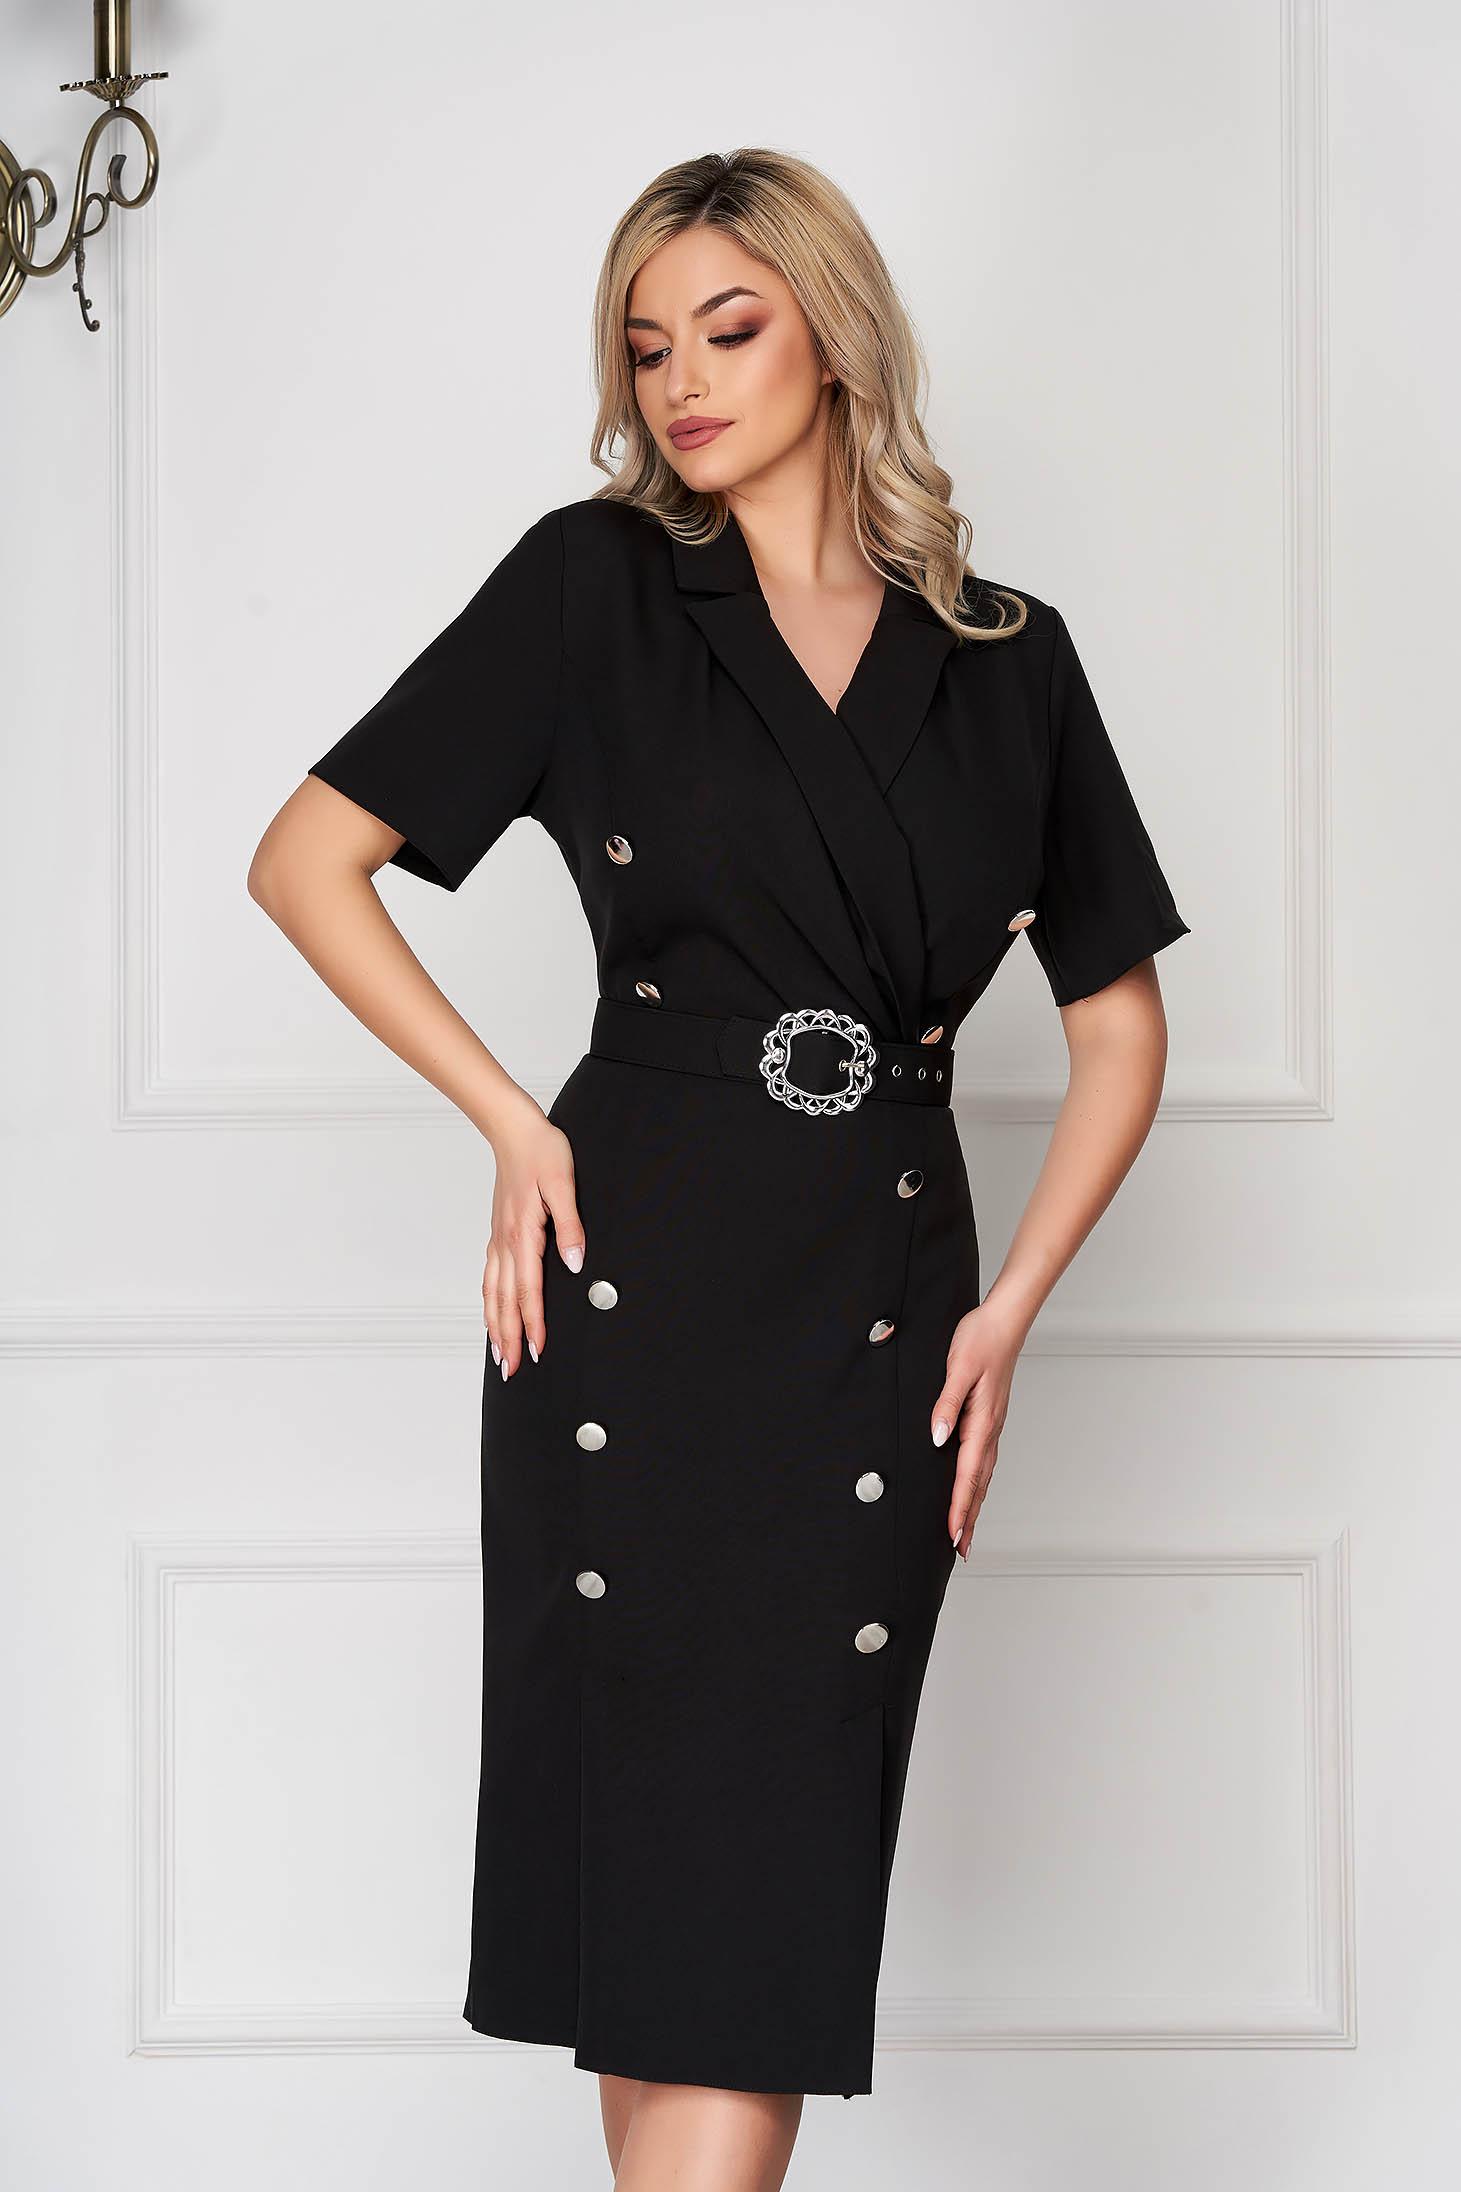 Rochie neagra eleganta midi tip creion din stofa subtire accesorizata cu nasturi